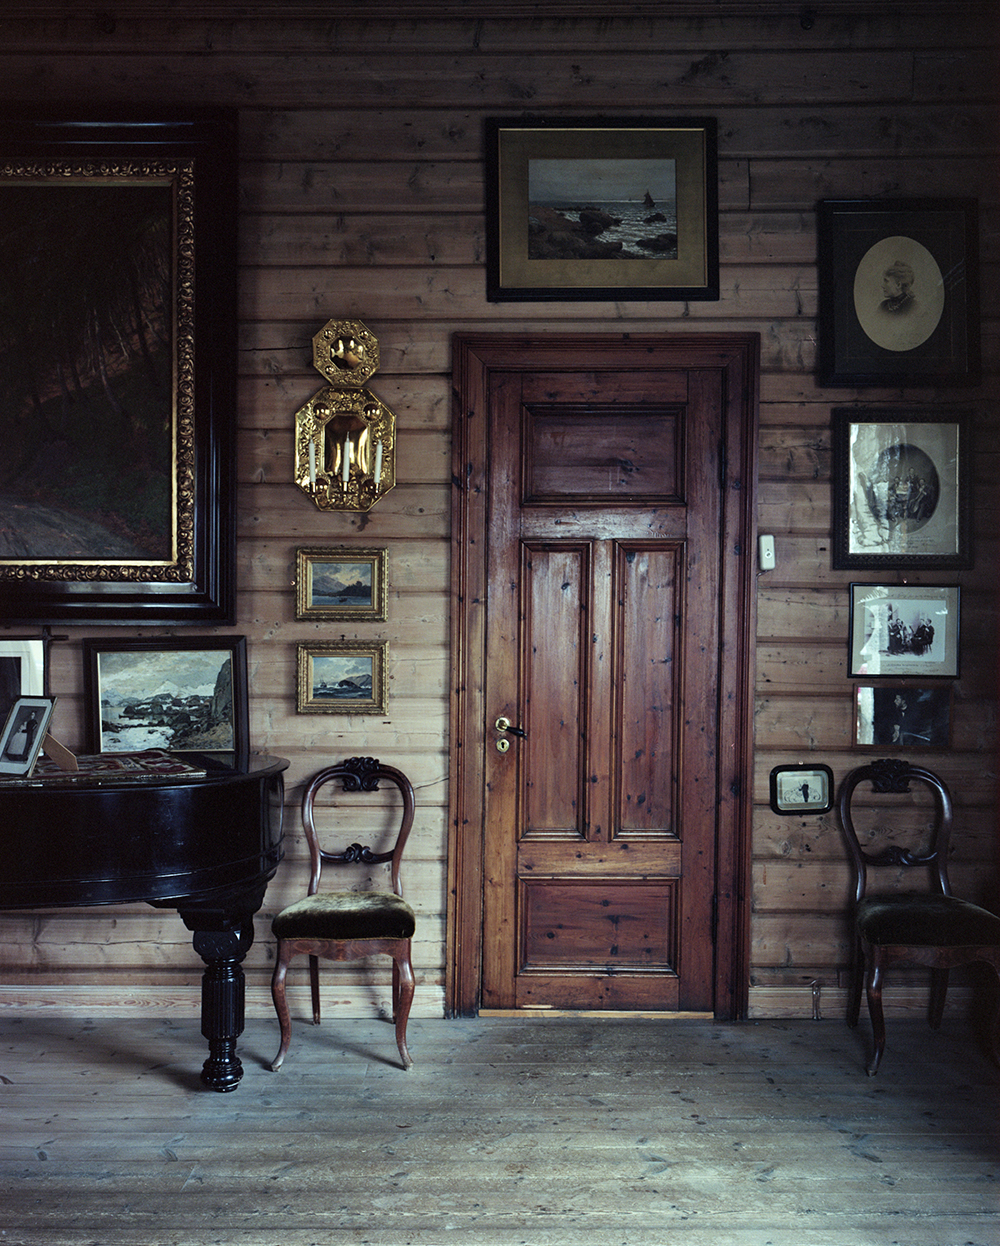 Edvard Grieg's living room